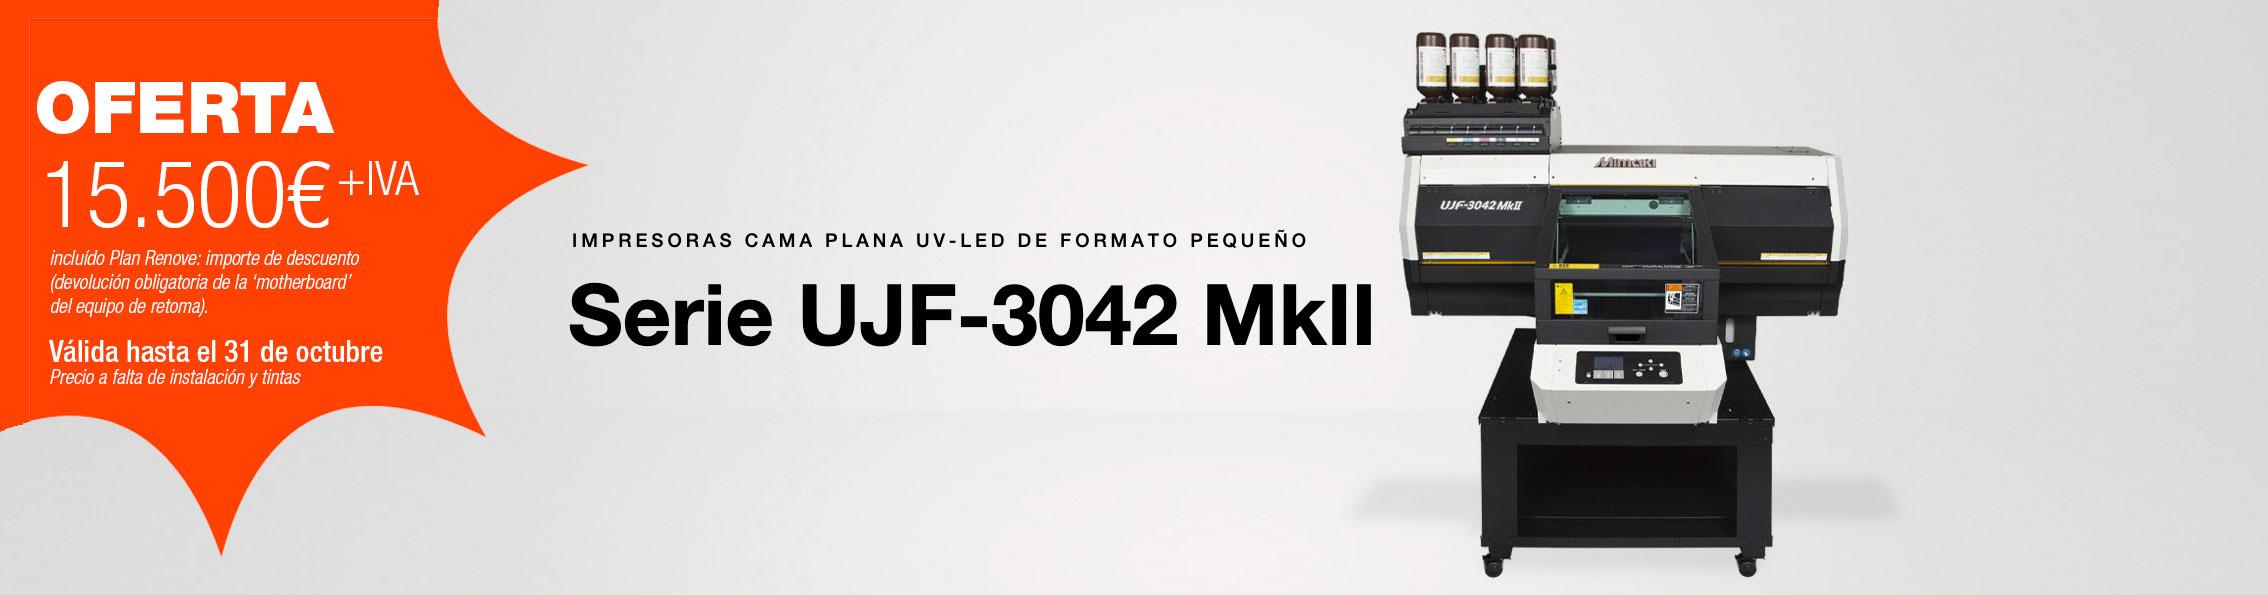 OFERTAS-UJF3042-MKII